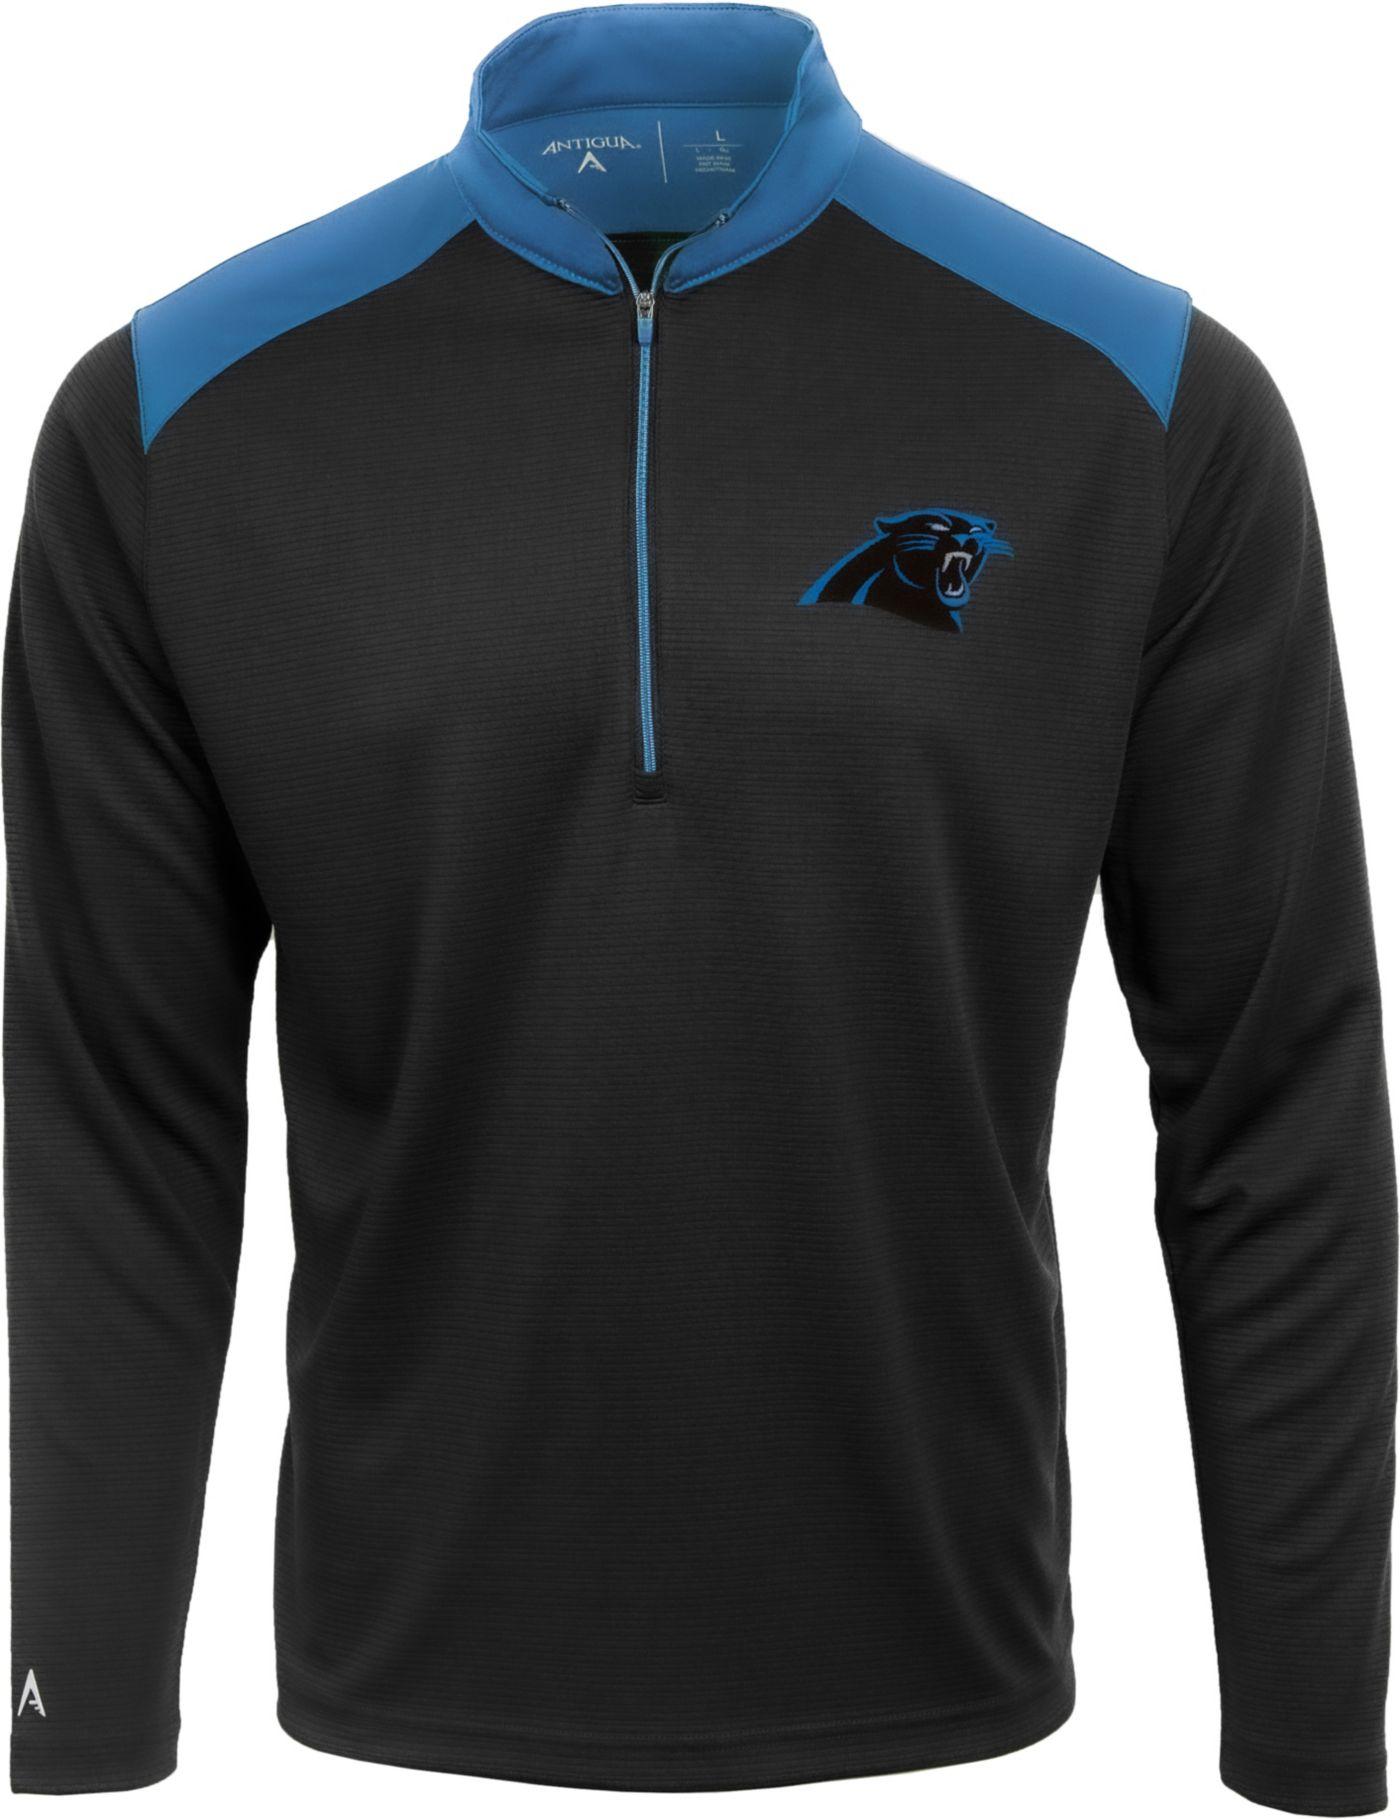 Antigua Men's Carolina Panthers Velocity Black Quarter-Zip Pullover